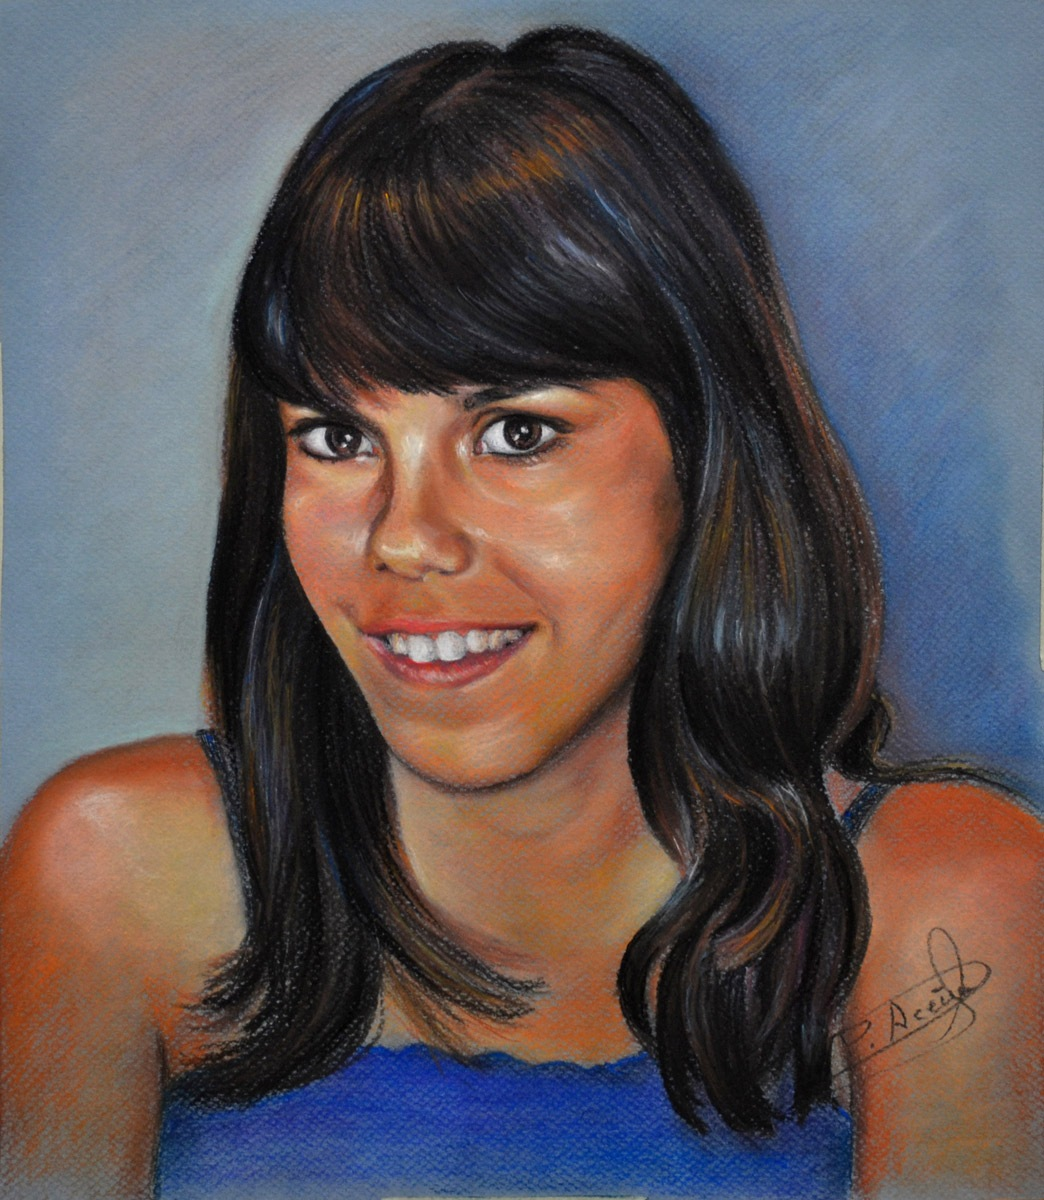 Lara. Obra de Pilar Aceña, pastel. 2011